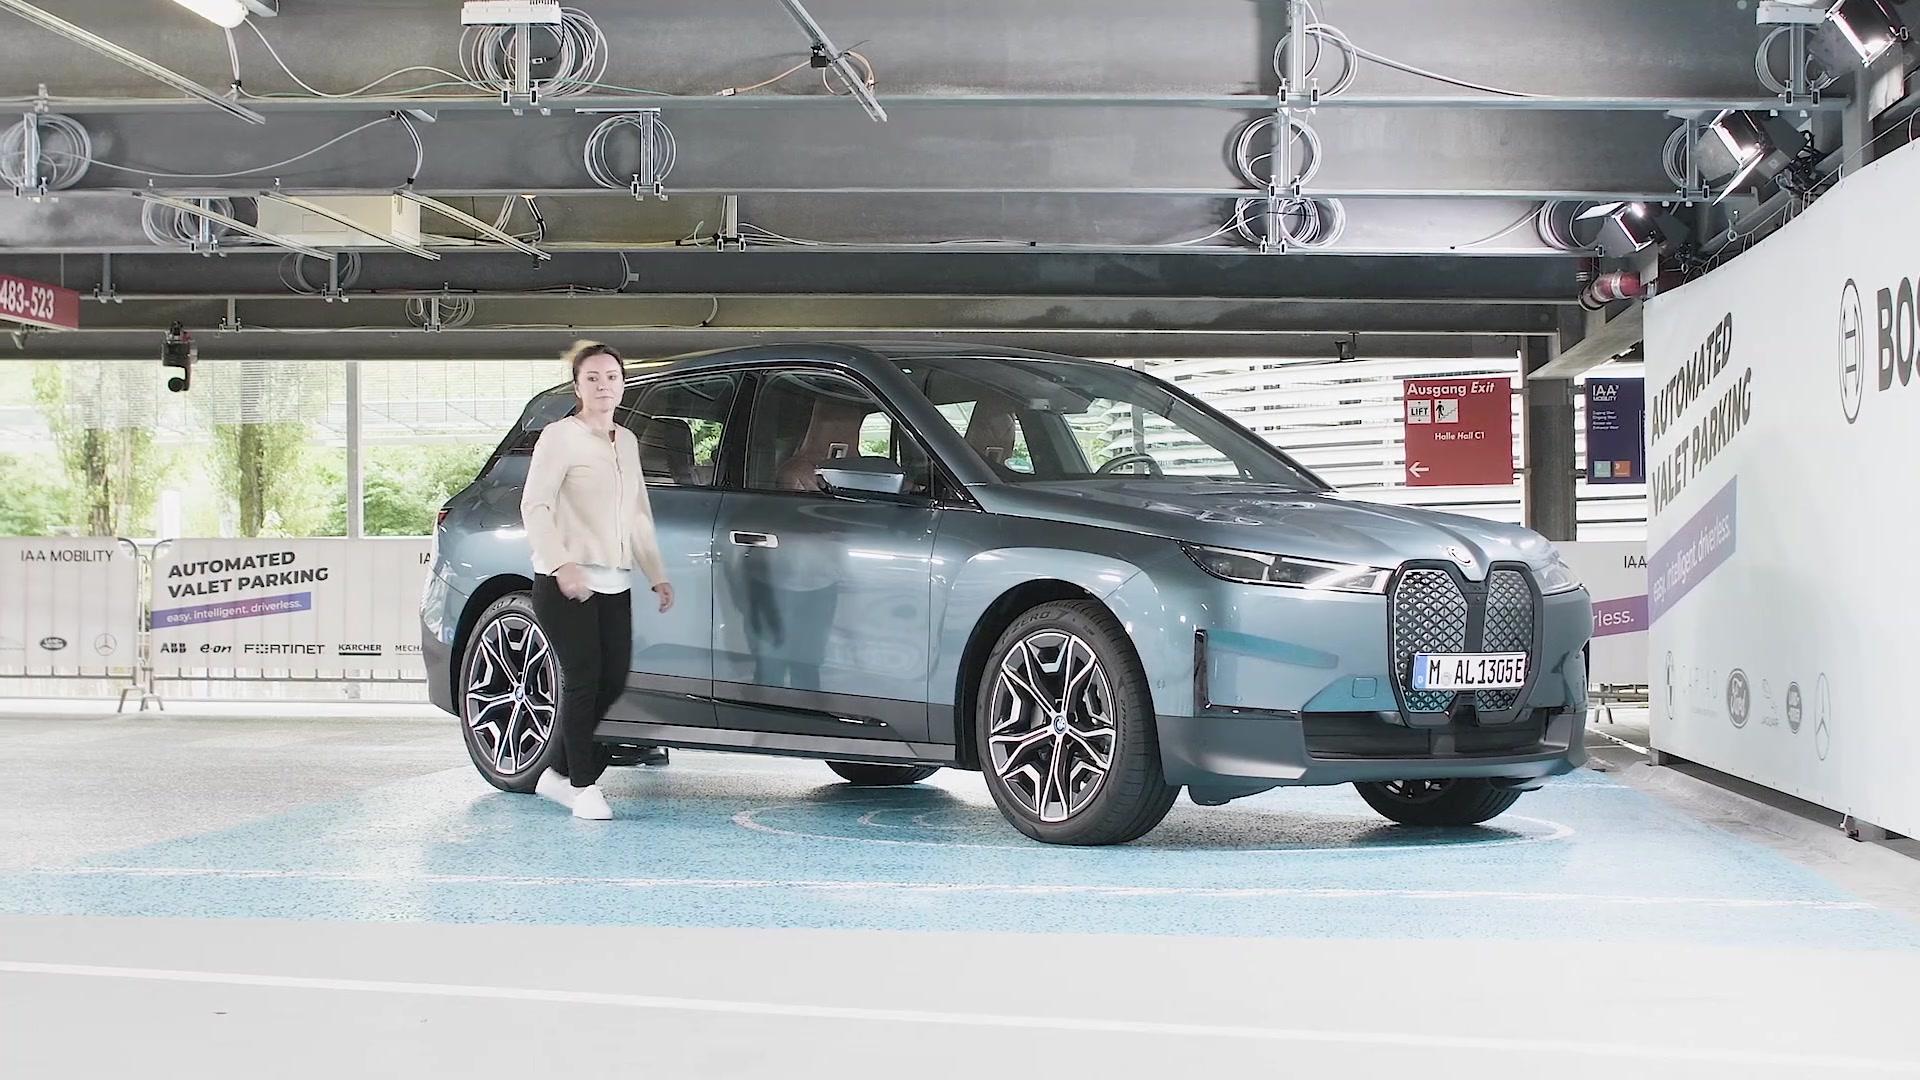 The new BMW iX - Automated Valet Parking @IAA MOBILITIY